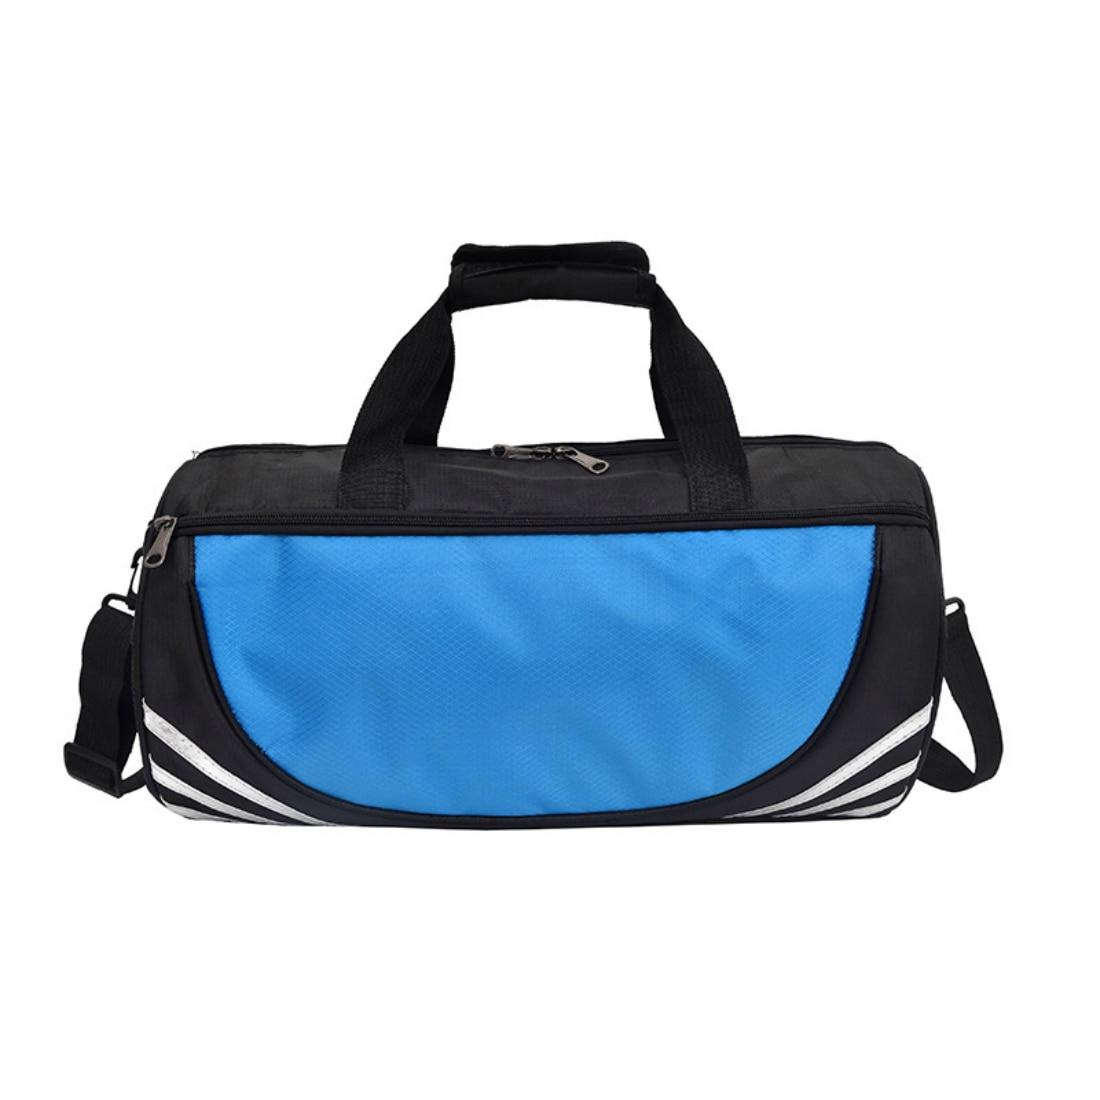 5 Colors Nylon Sports Gym Bag Women Men Fitness For Yoga Travel Training Ultralight Duffle Shoes Small Sac De Sport Bag